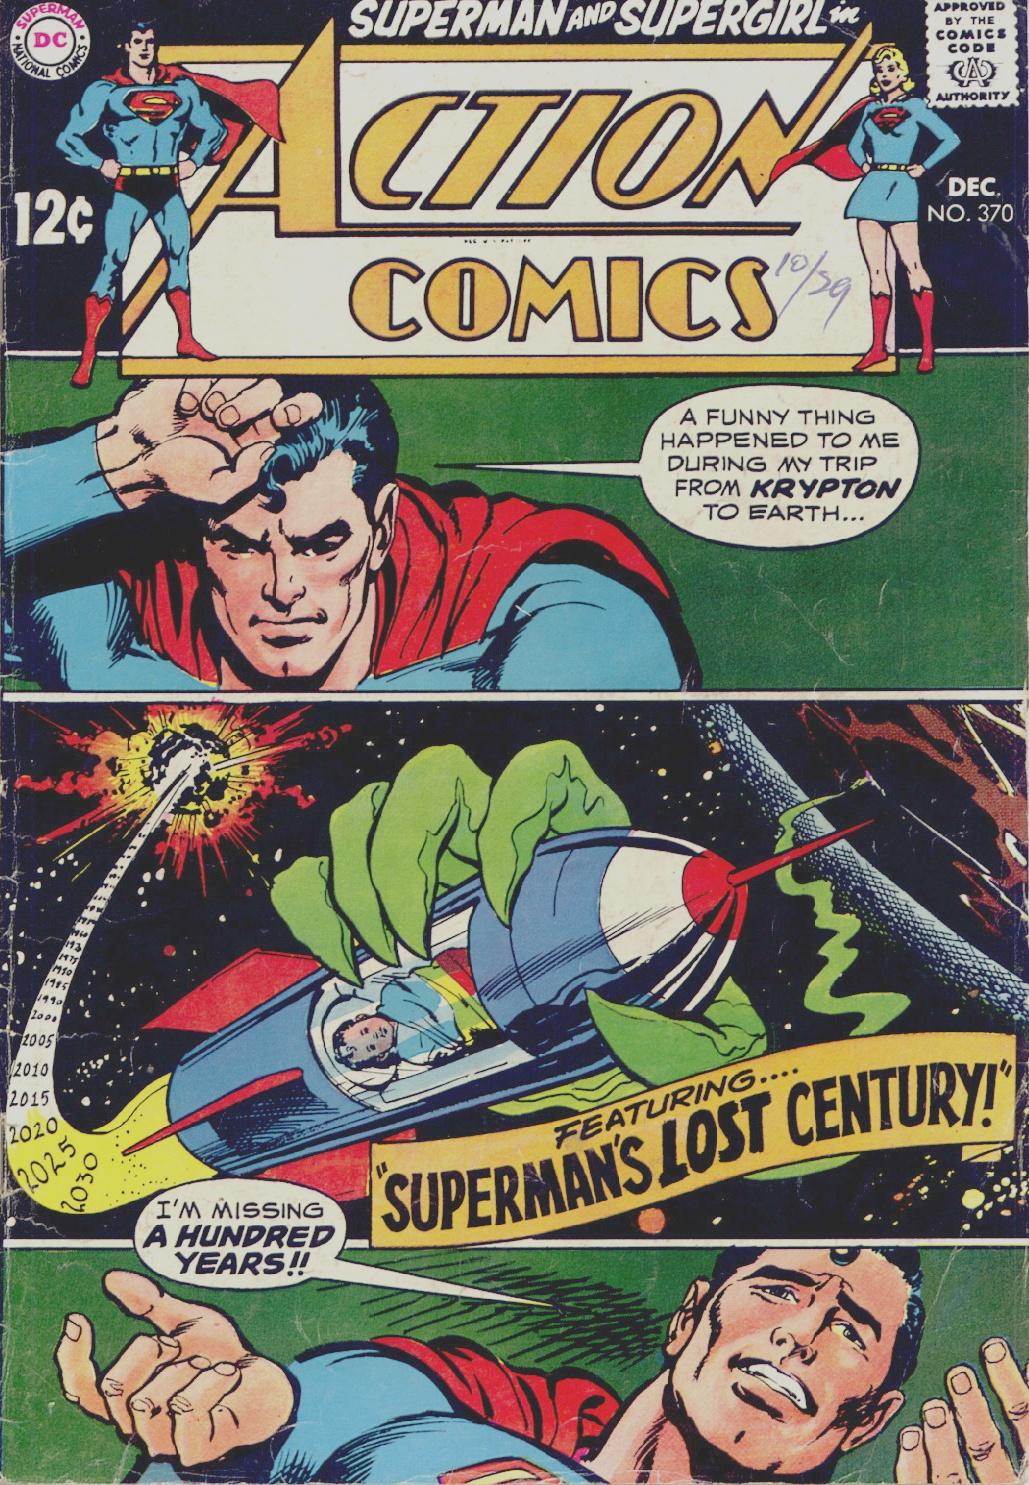 Action Comics (1938) 370 Page 1